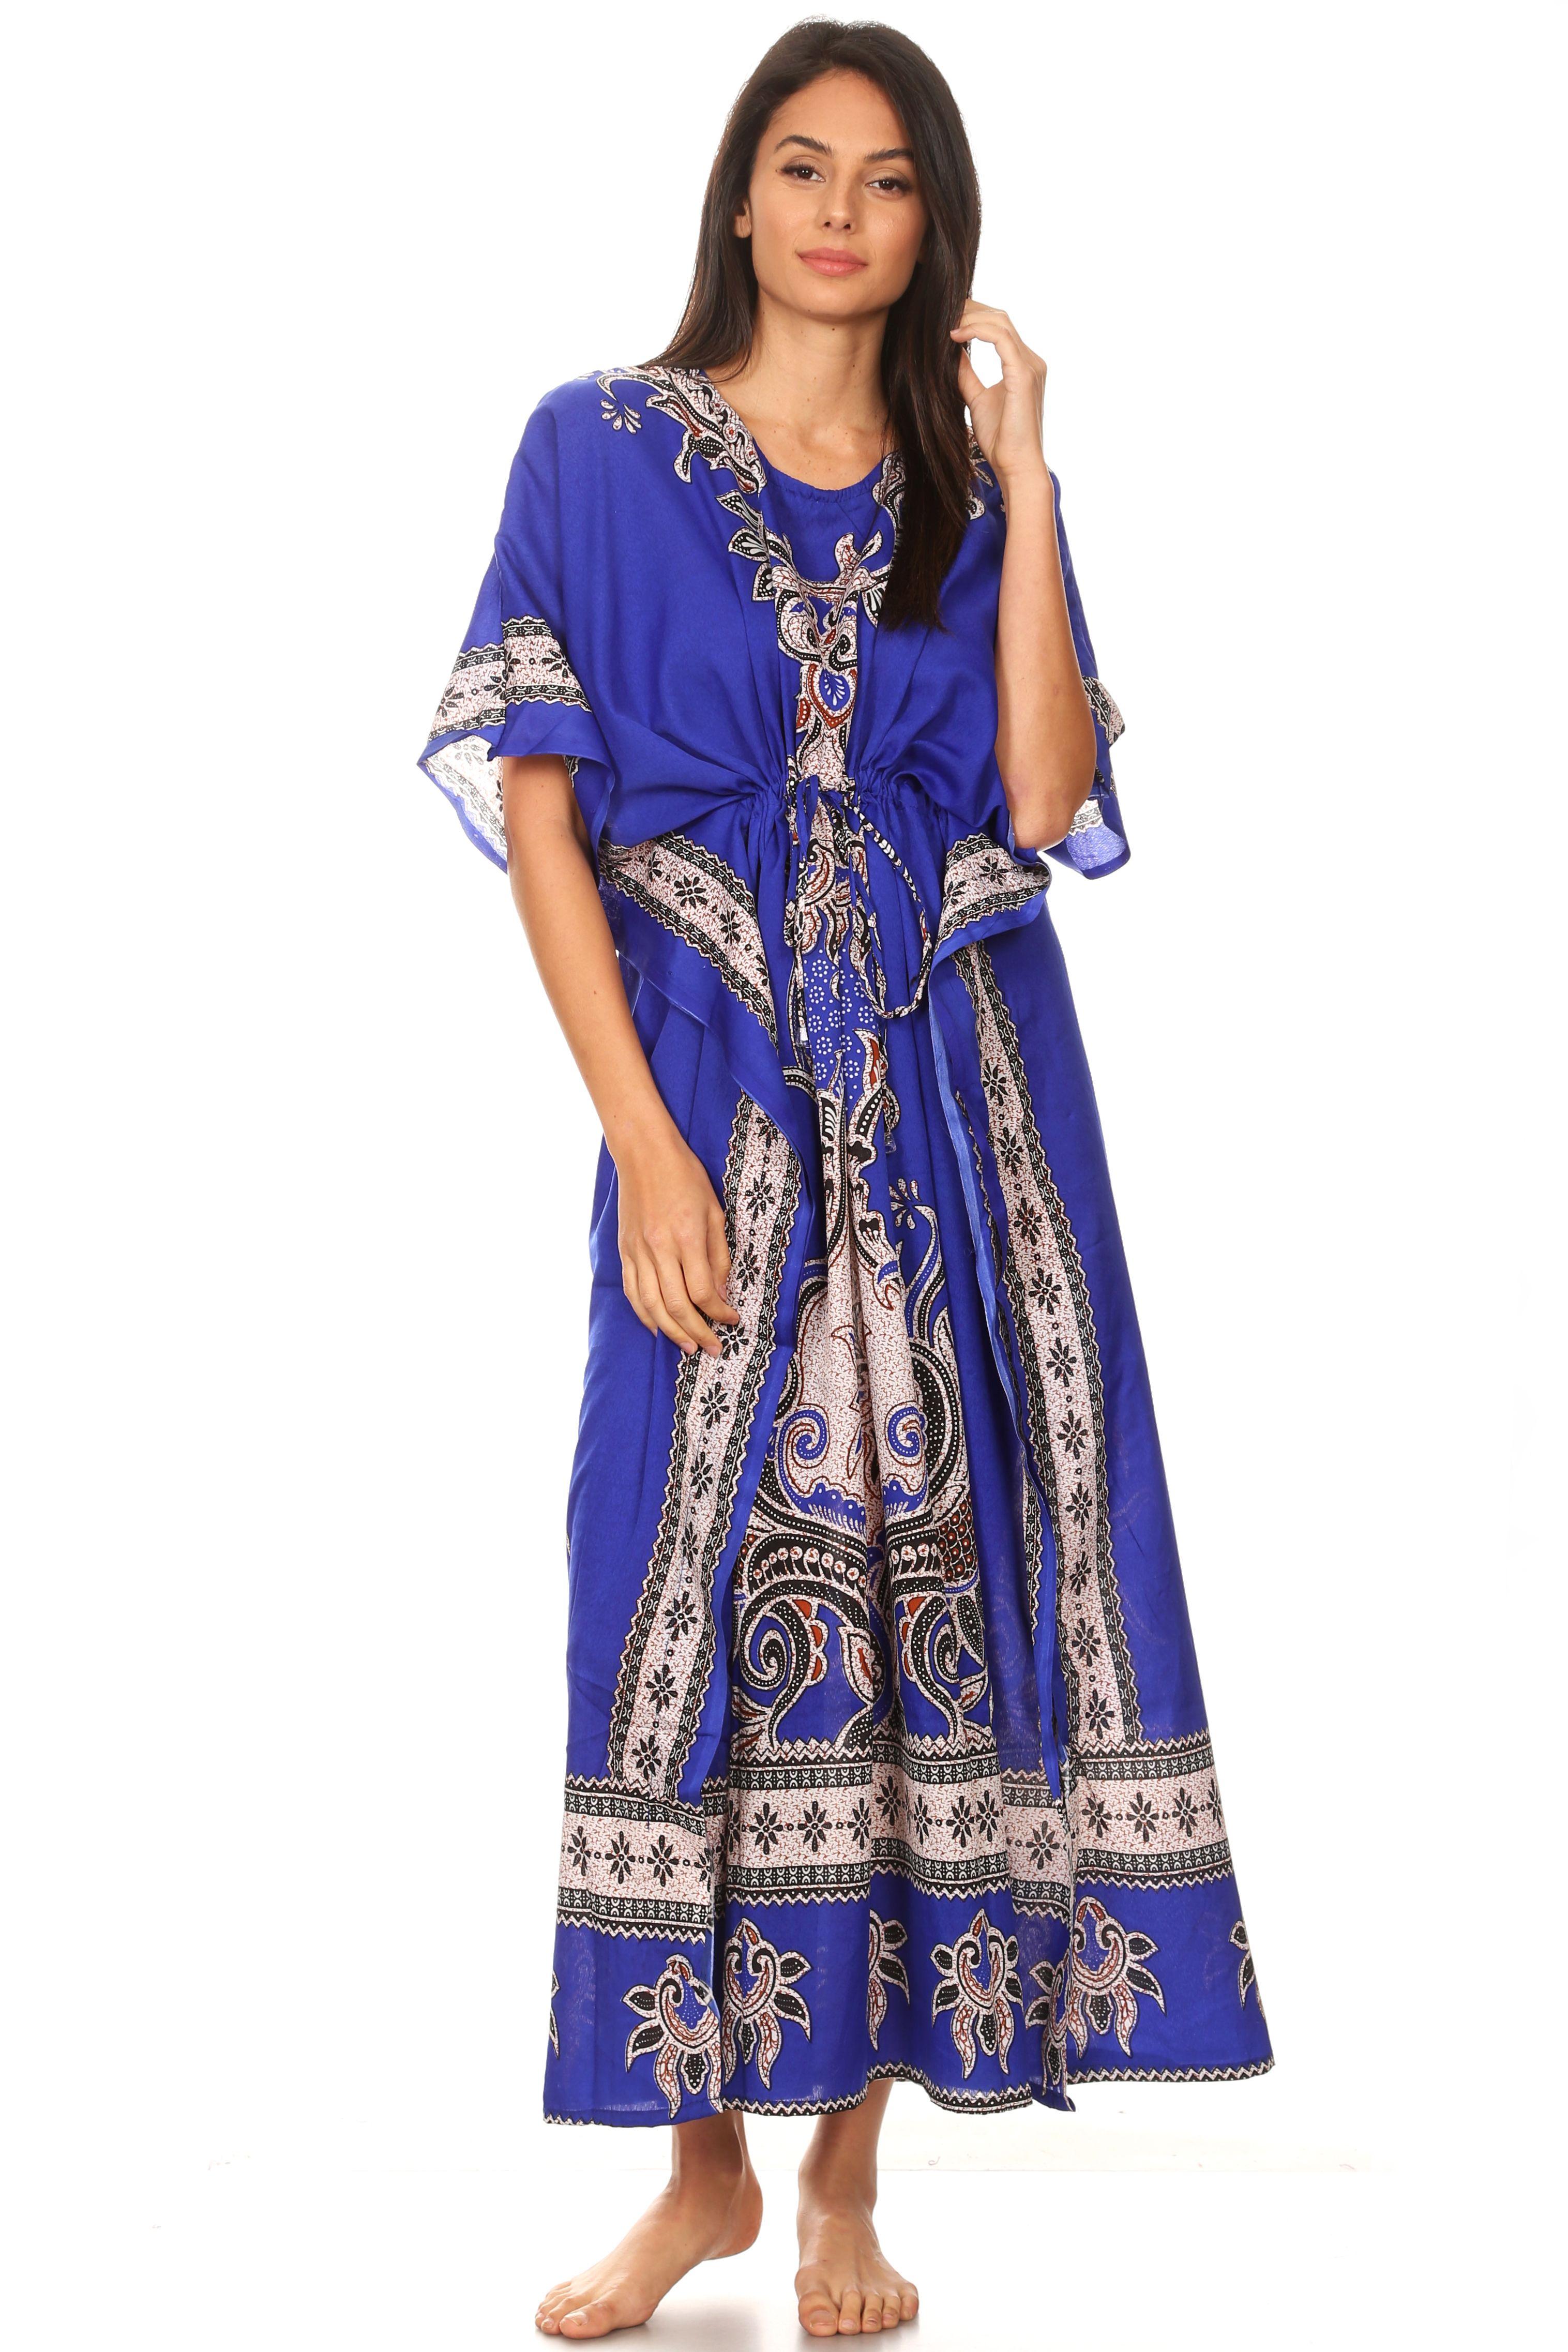 Premiere Fashion Caftan Dresses For Women V Neck Long Kaftan Cover Up Summer Maxi Dress Walmart Com Summer Maxi Dress Vintage Maxi Dress Maxi Dresses Summer Casual [ 4548 x 3032 Pixel ]